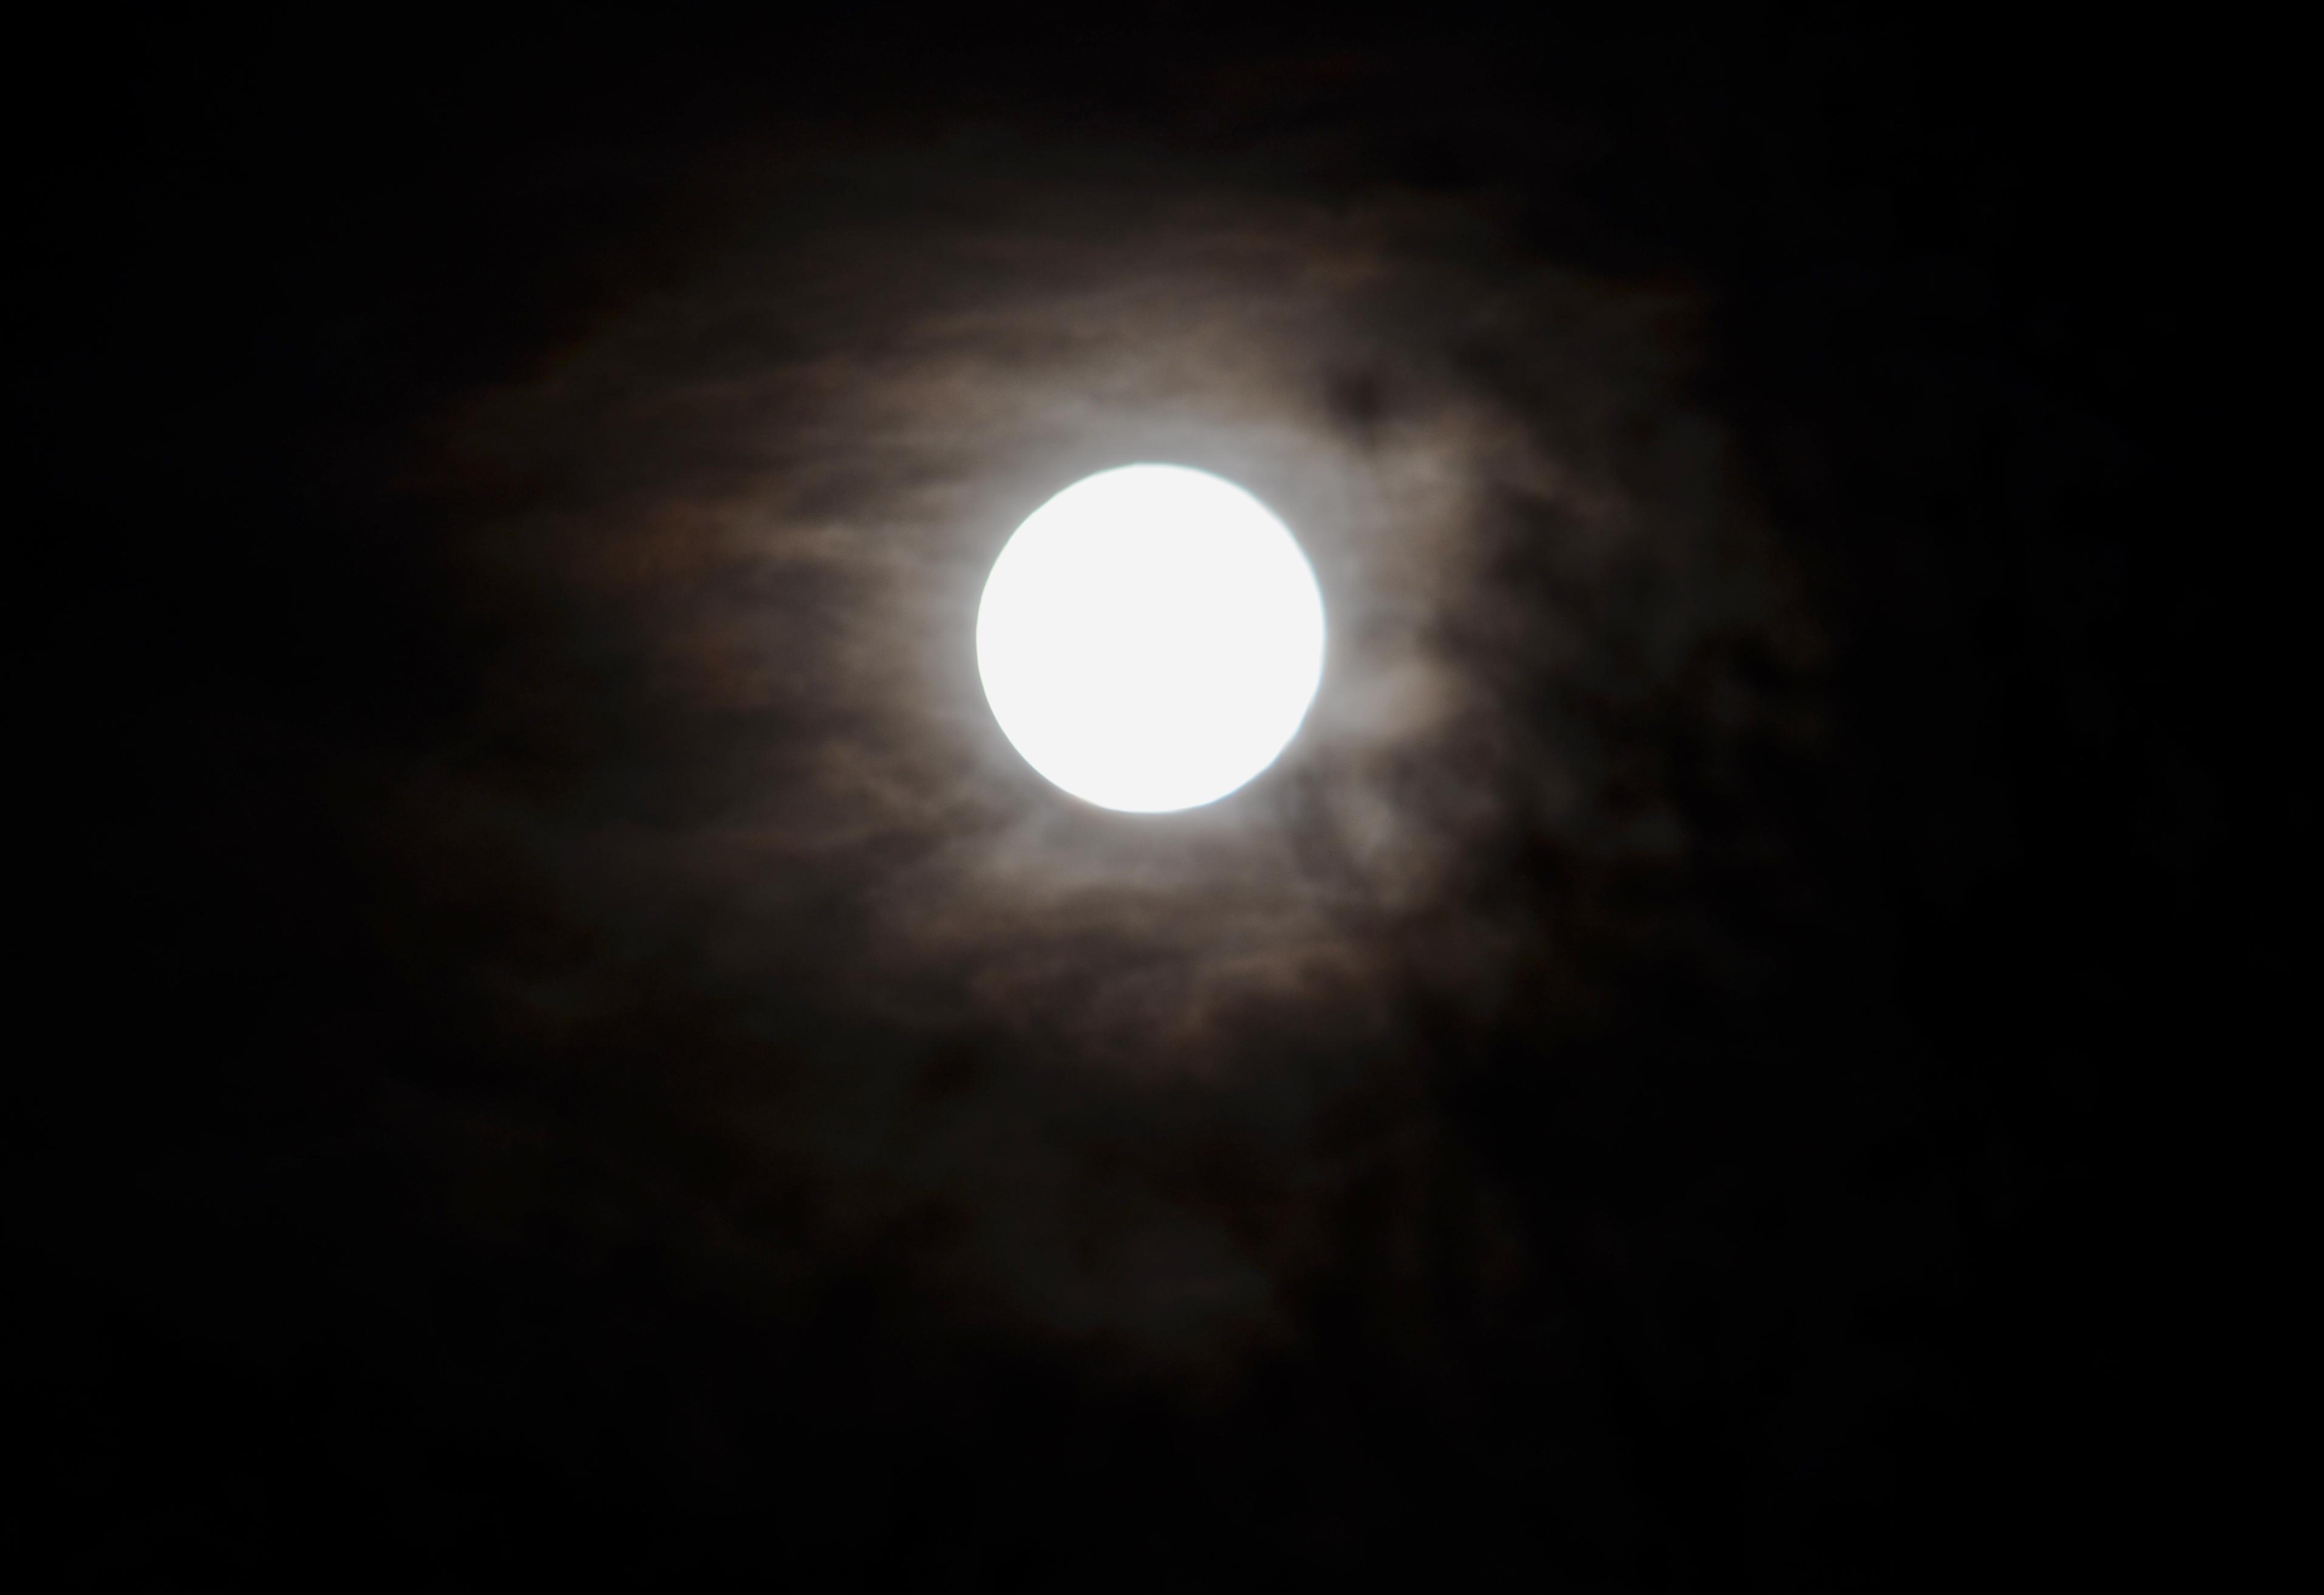 Super Bright Full Moon – 67steffen